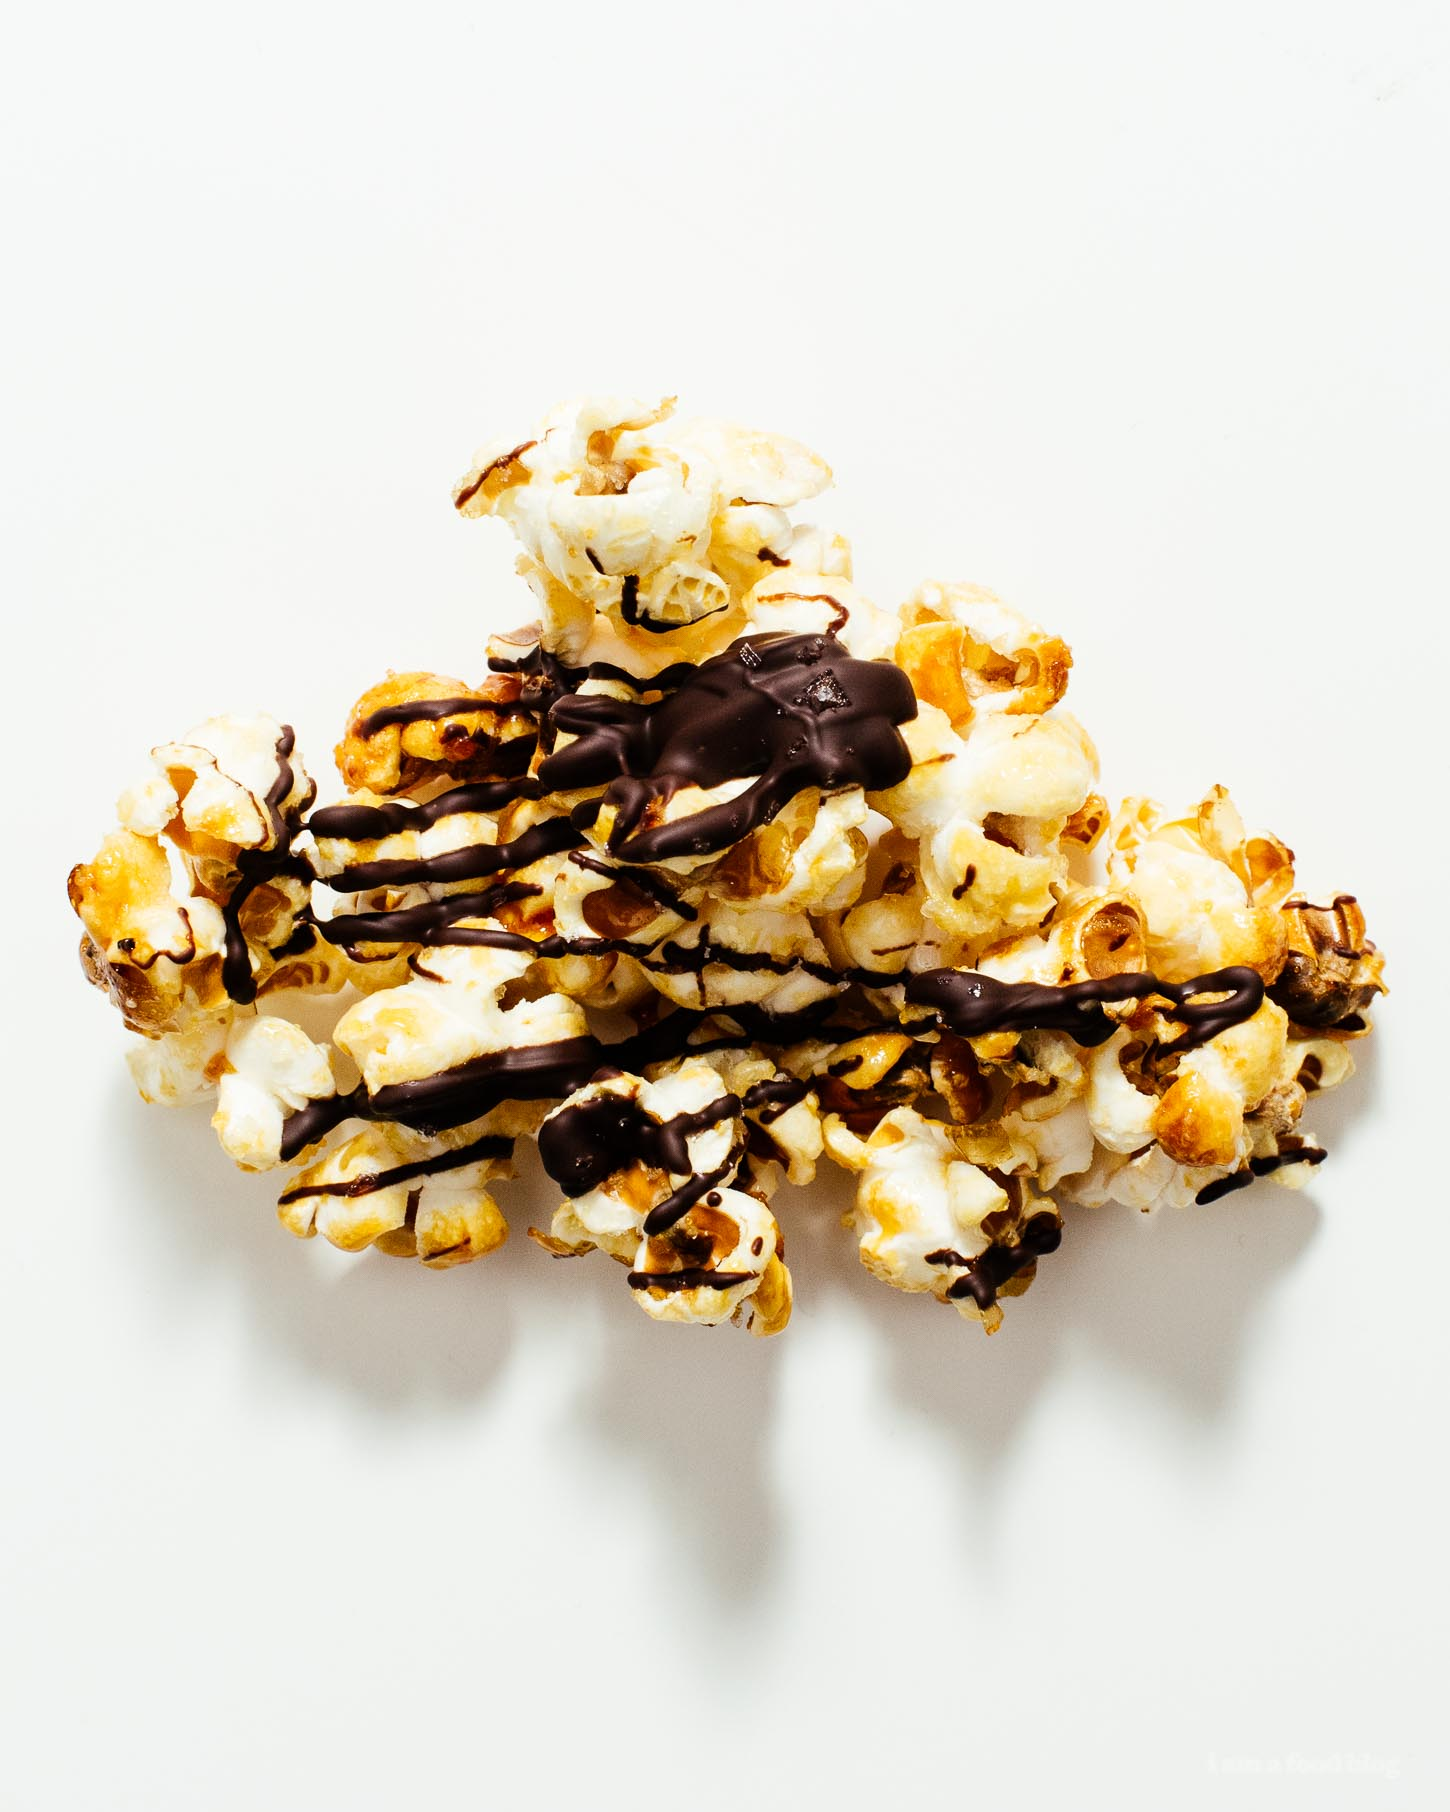 Dark Chocolatey Drizzled Flaky Sea Salt Kettle Corn | www.iamafoodblog.com